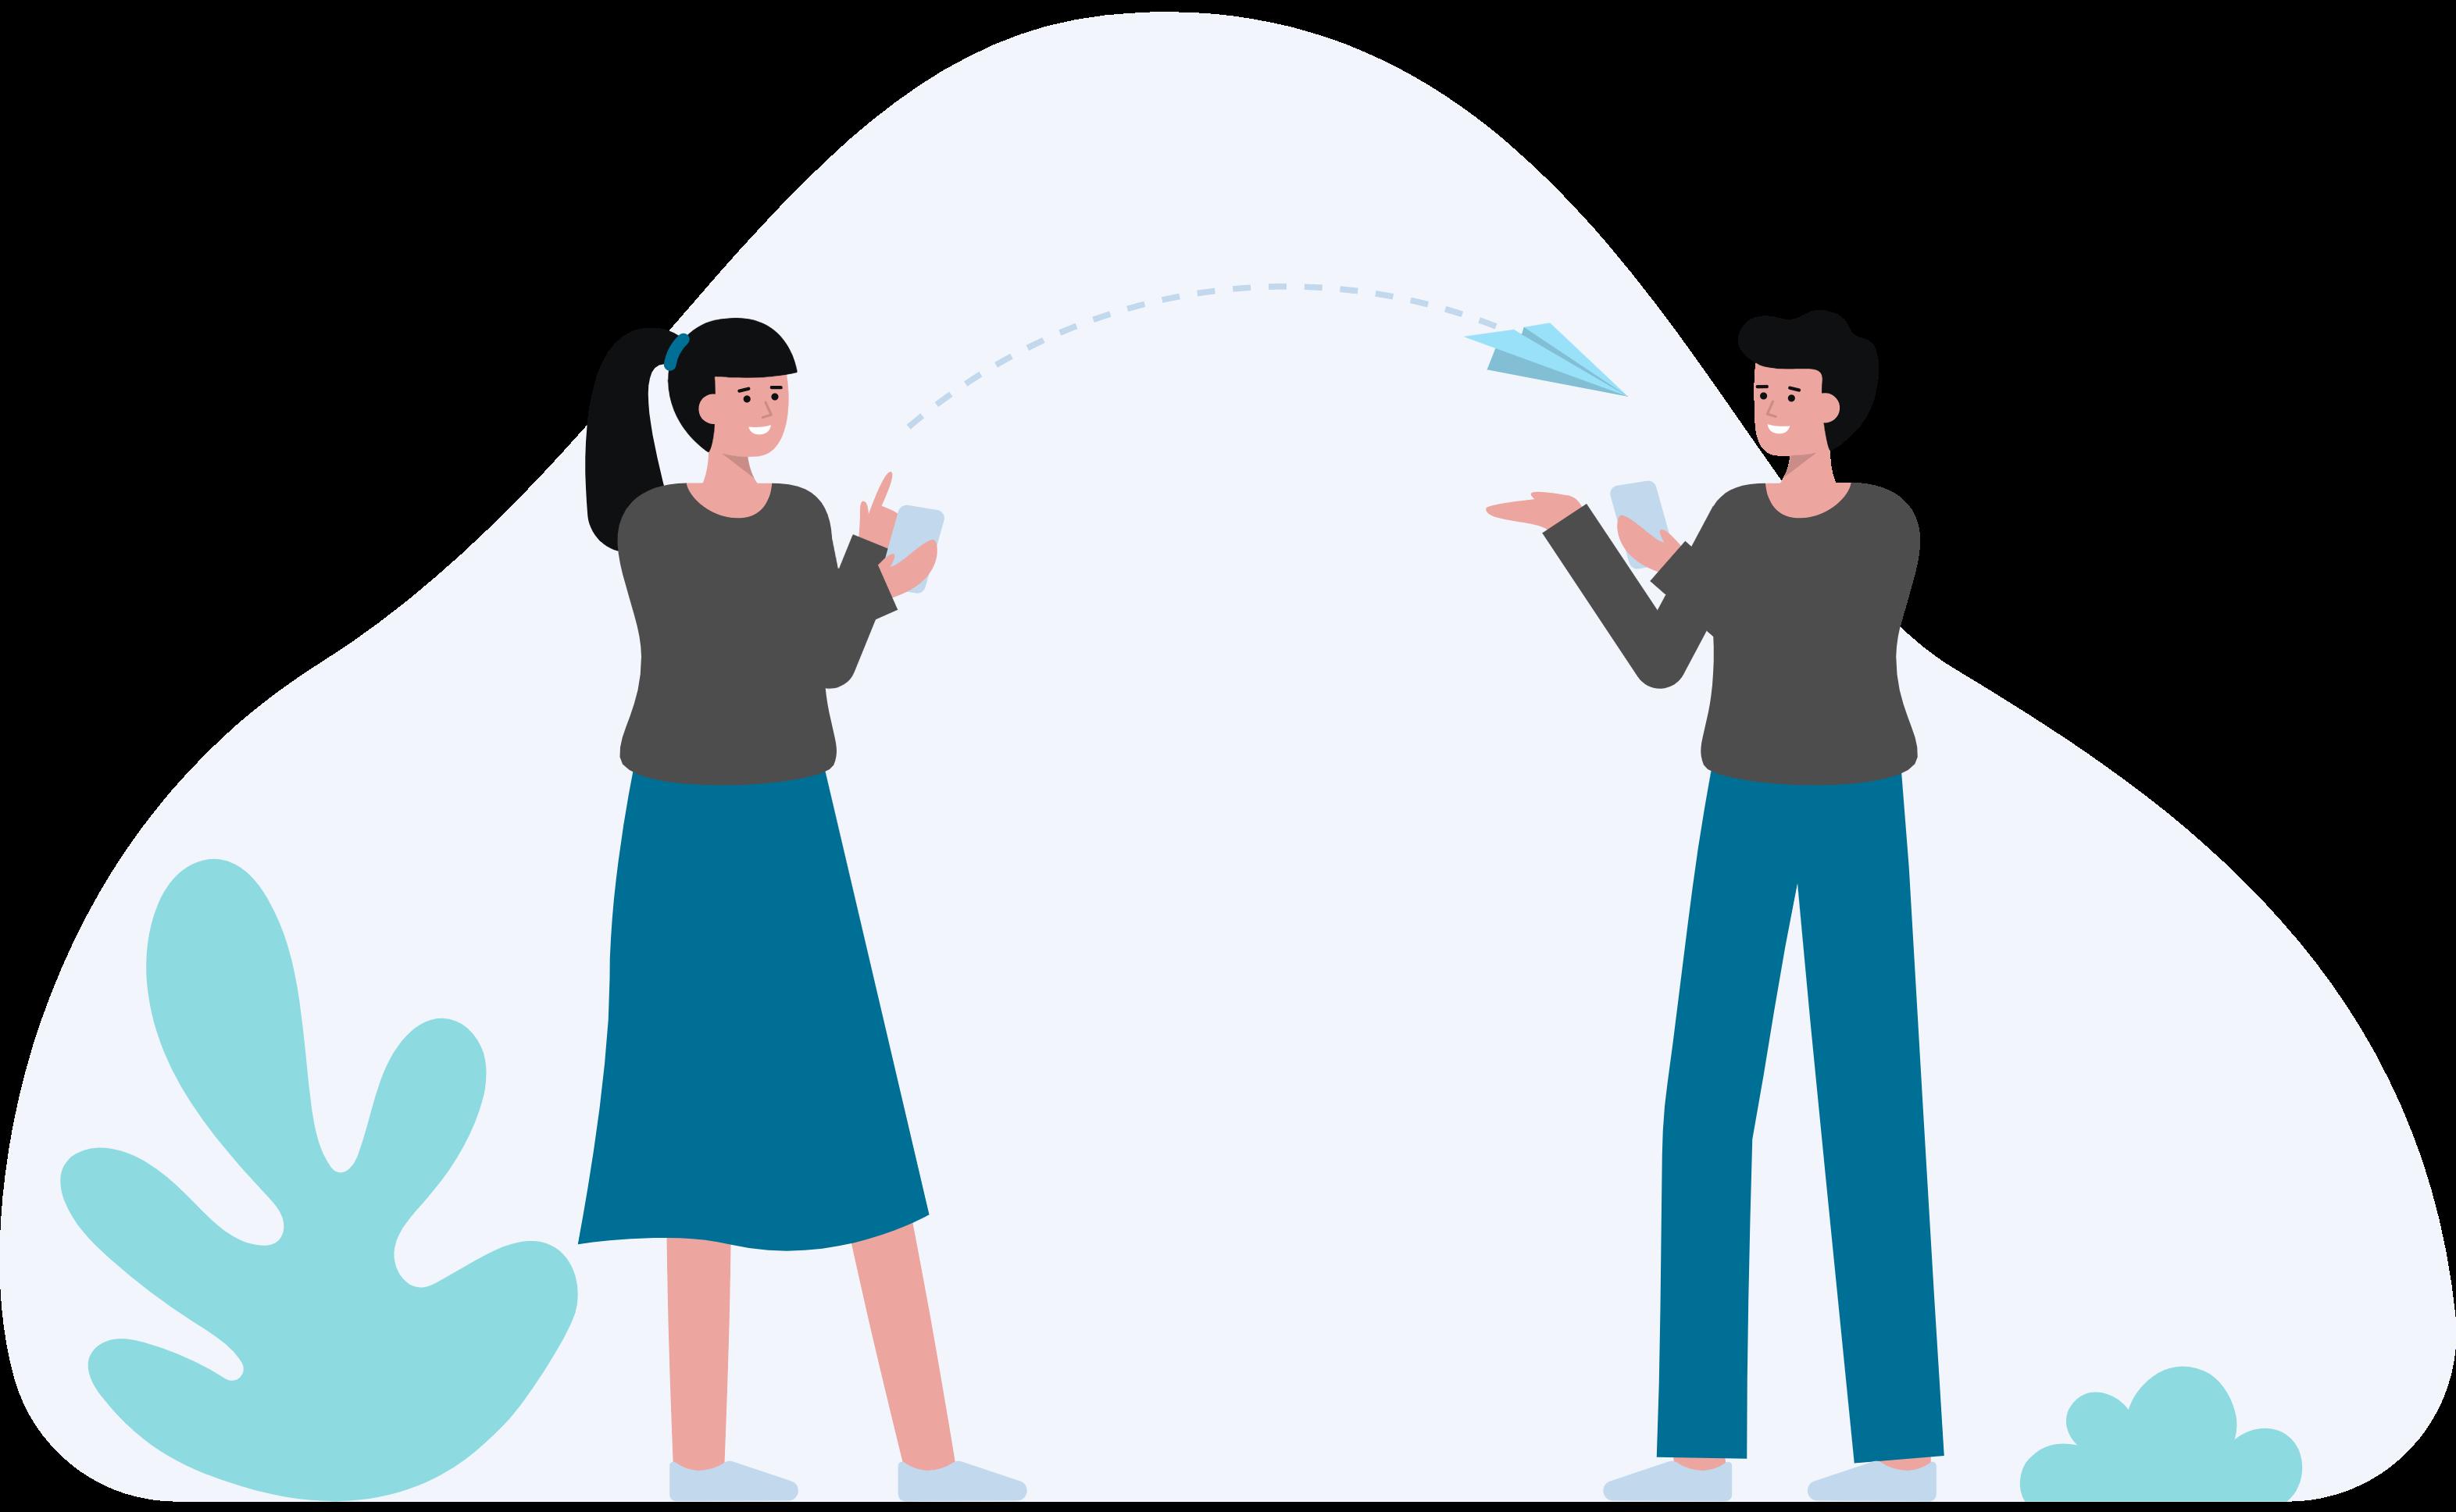 Two people sending digital messages